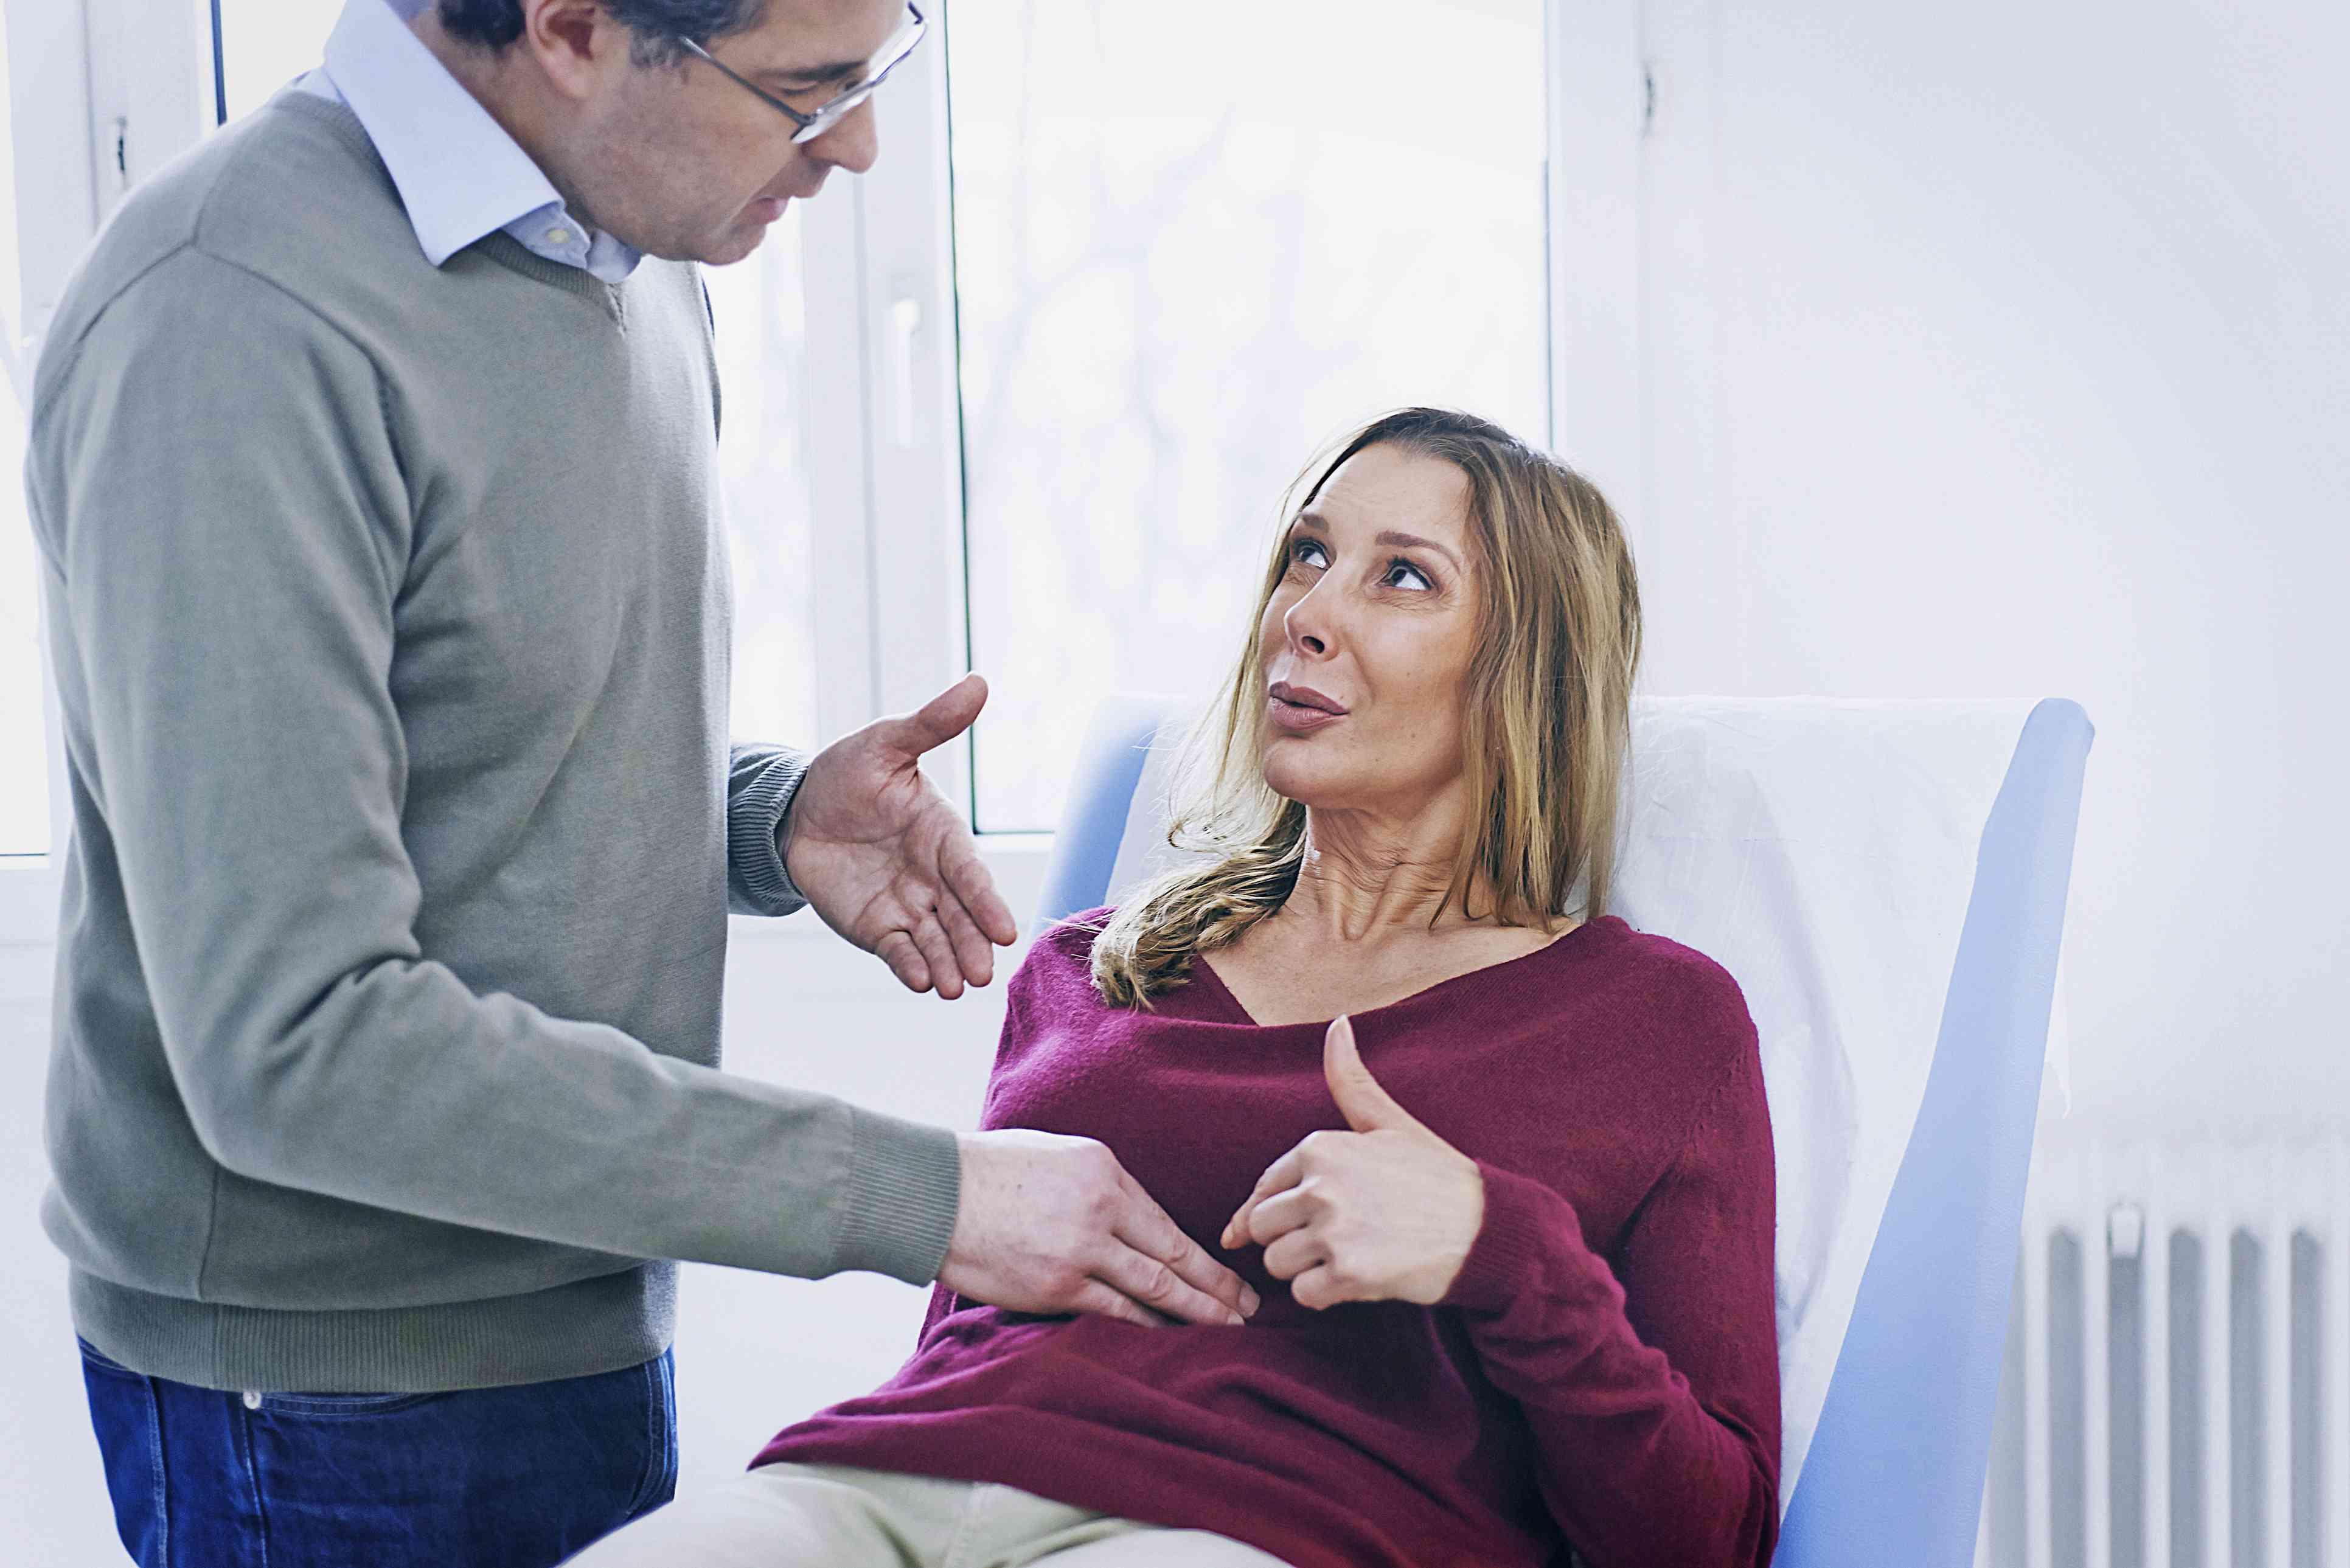 Doctor in casual clothes examining a patient's abdomen